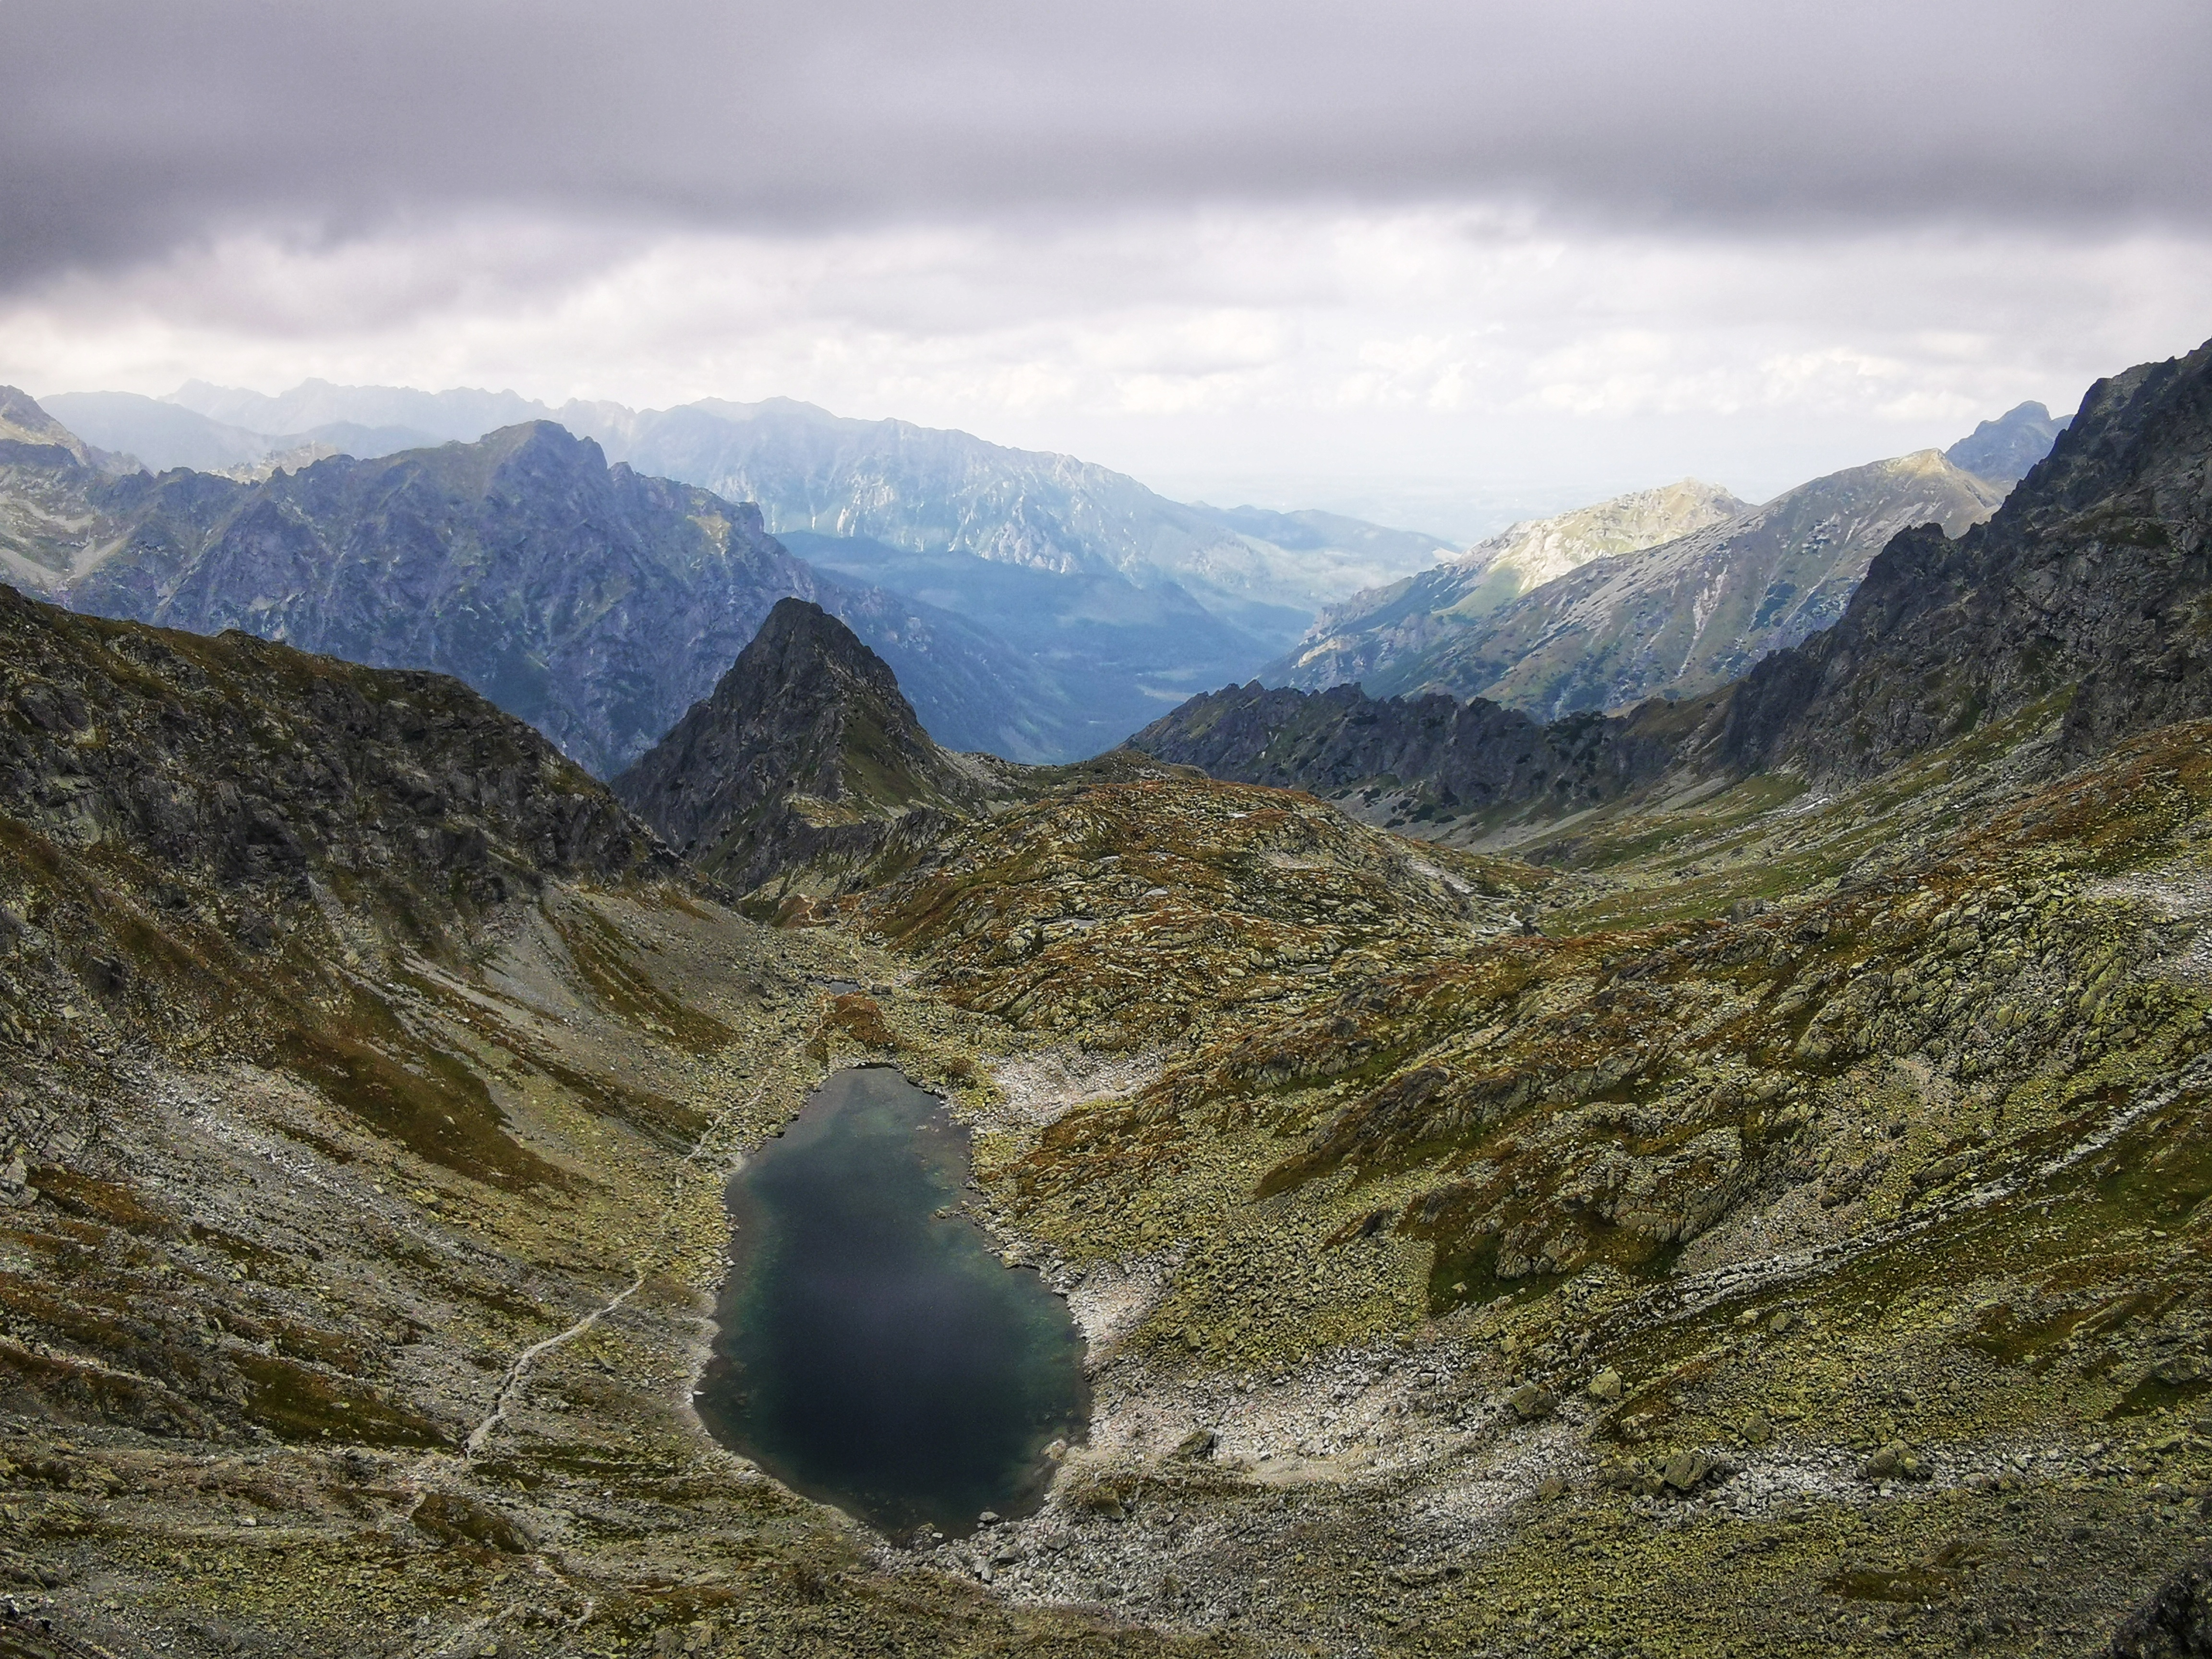 Zamrznuté pleso mountain lake.